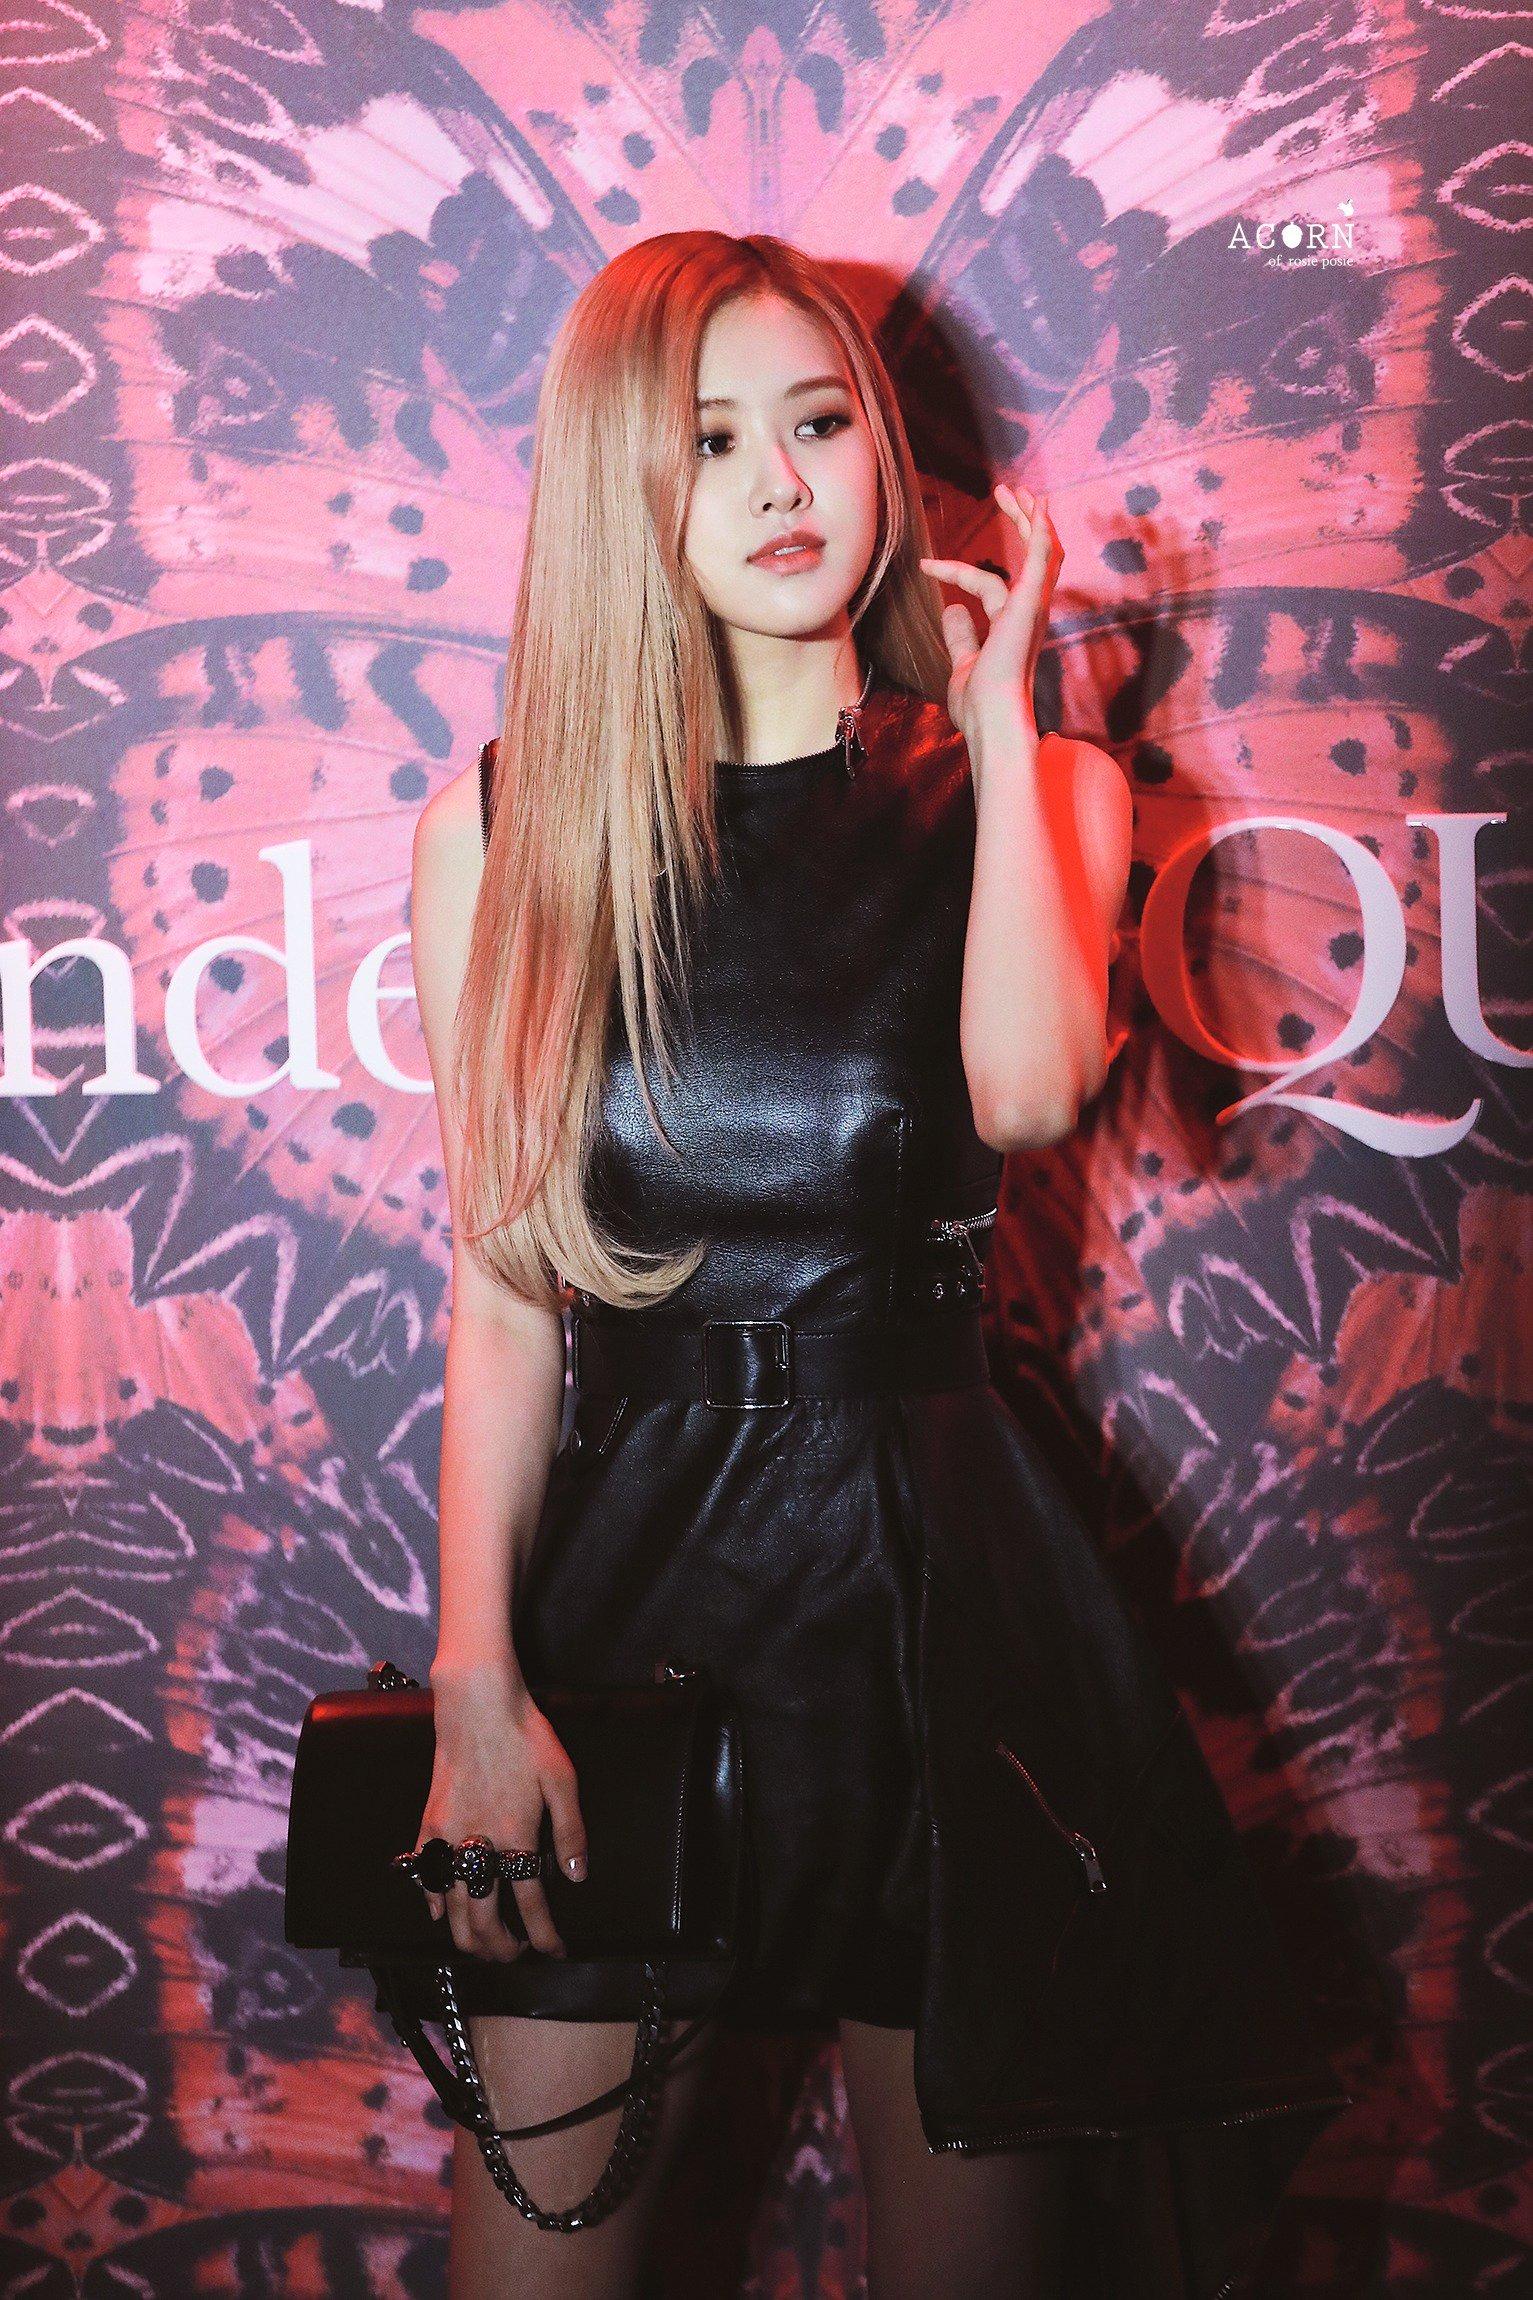 Rosé mặc đầm da màu đen